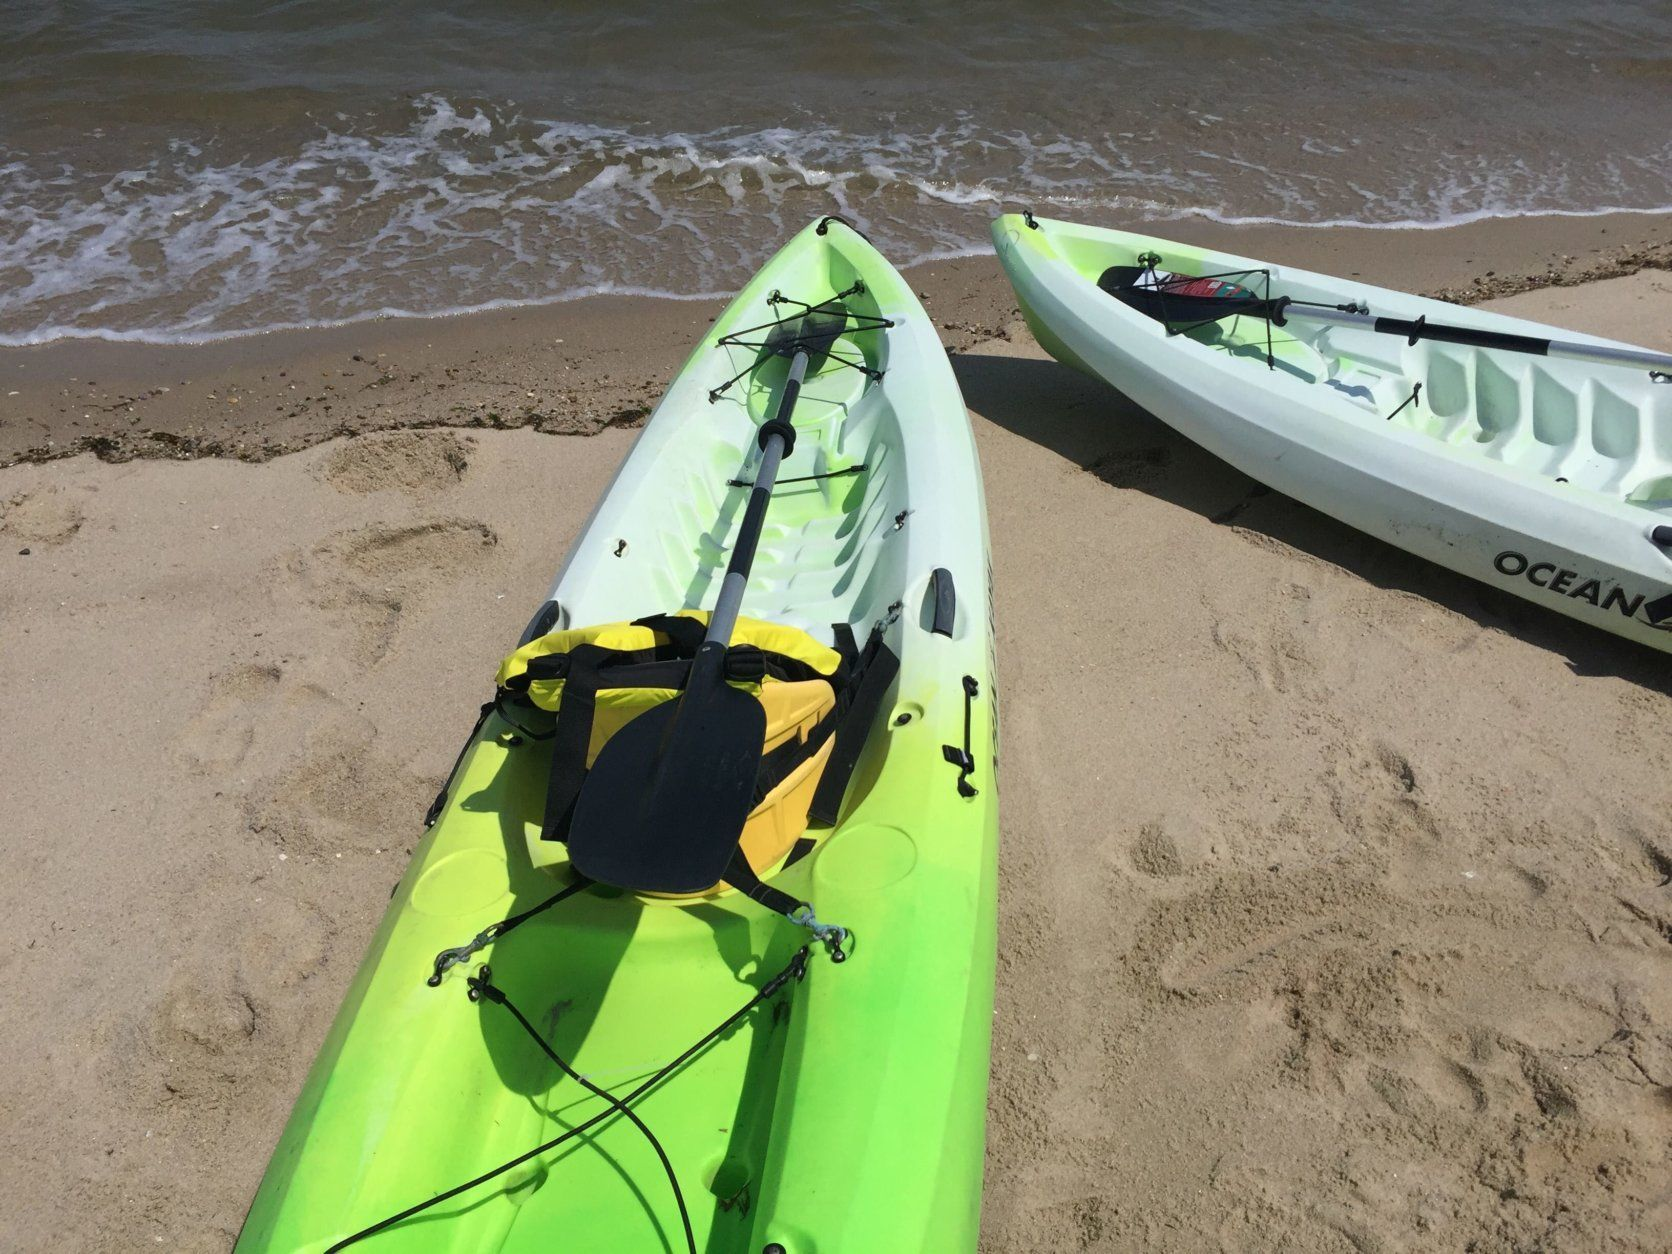 Kayaking is a wildly popular summertime activity. (WTOP/John Domen)